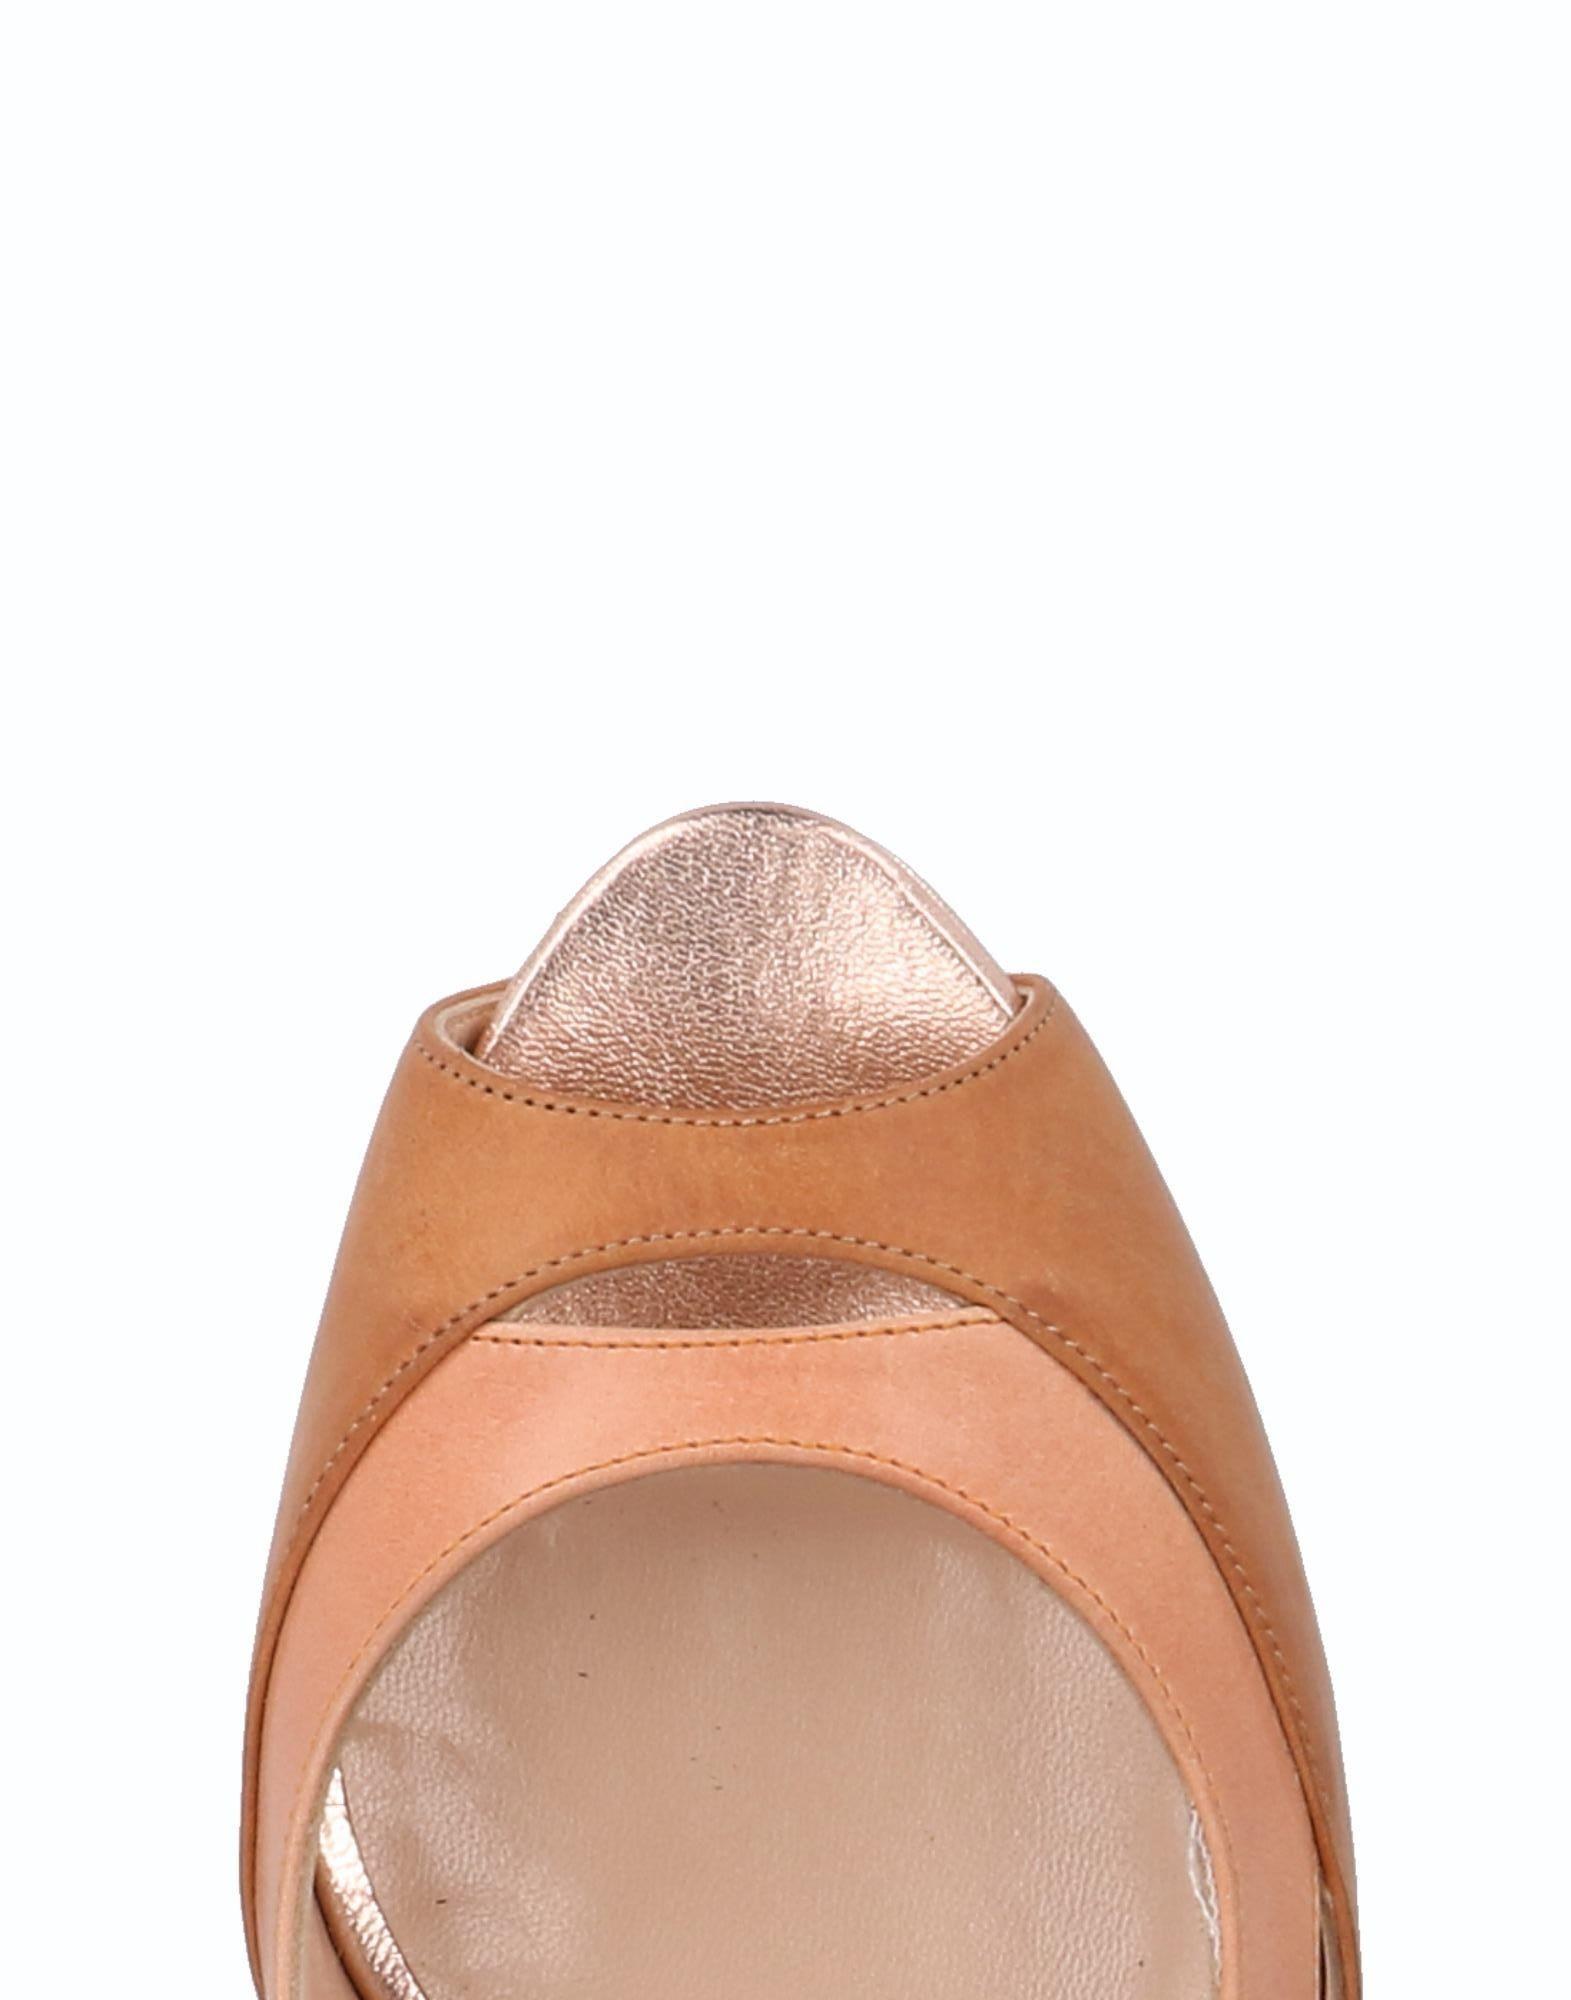 Moá Sandalen Damen  11501268OM Schuhe Gute Qualität beliebte Schuhe 11501268OM 7ccdab